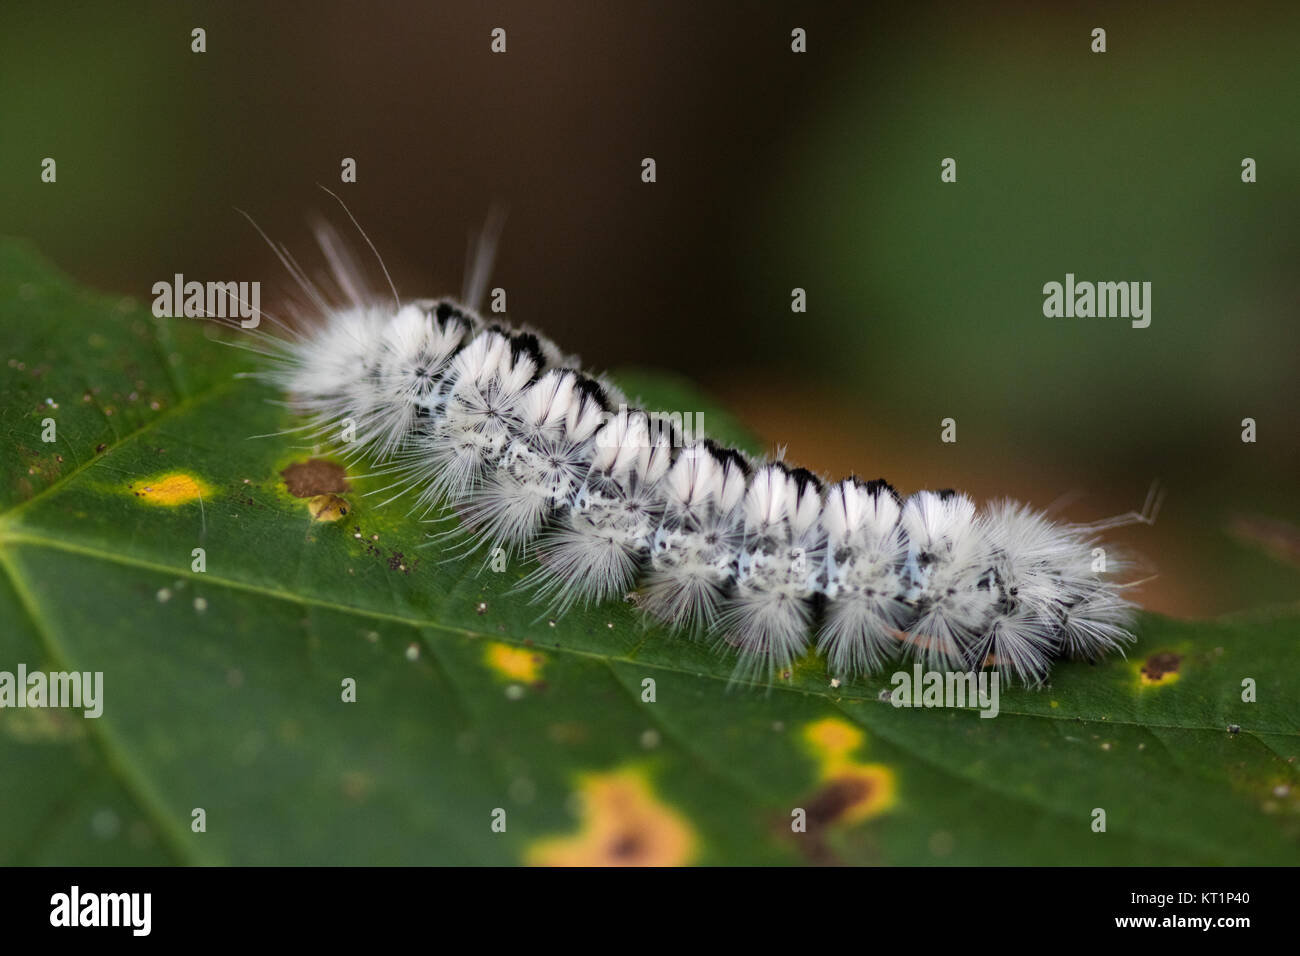 Hickory tussock moth caterpillar (Lophocampa caryae) on a hickory leaf - Stock Image